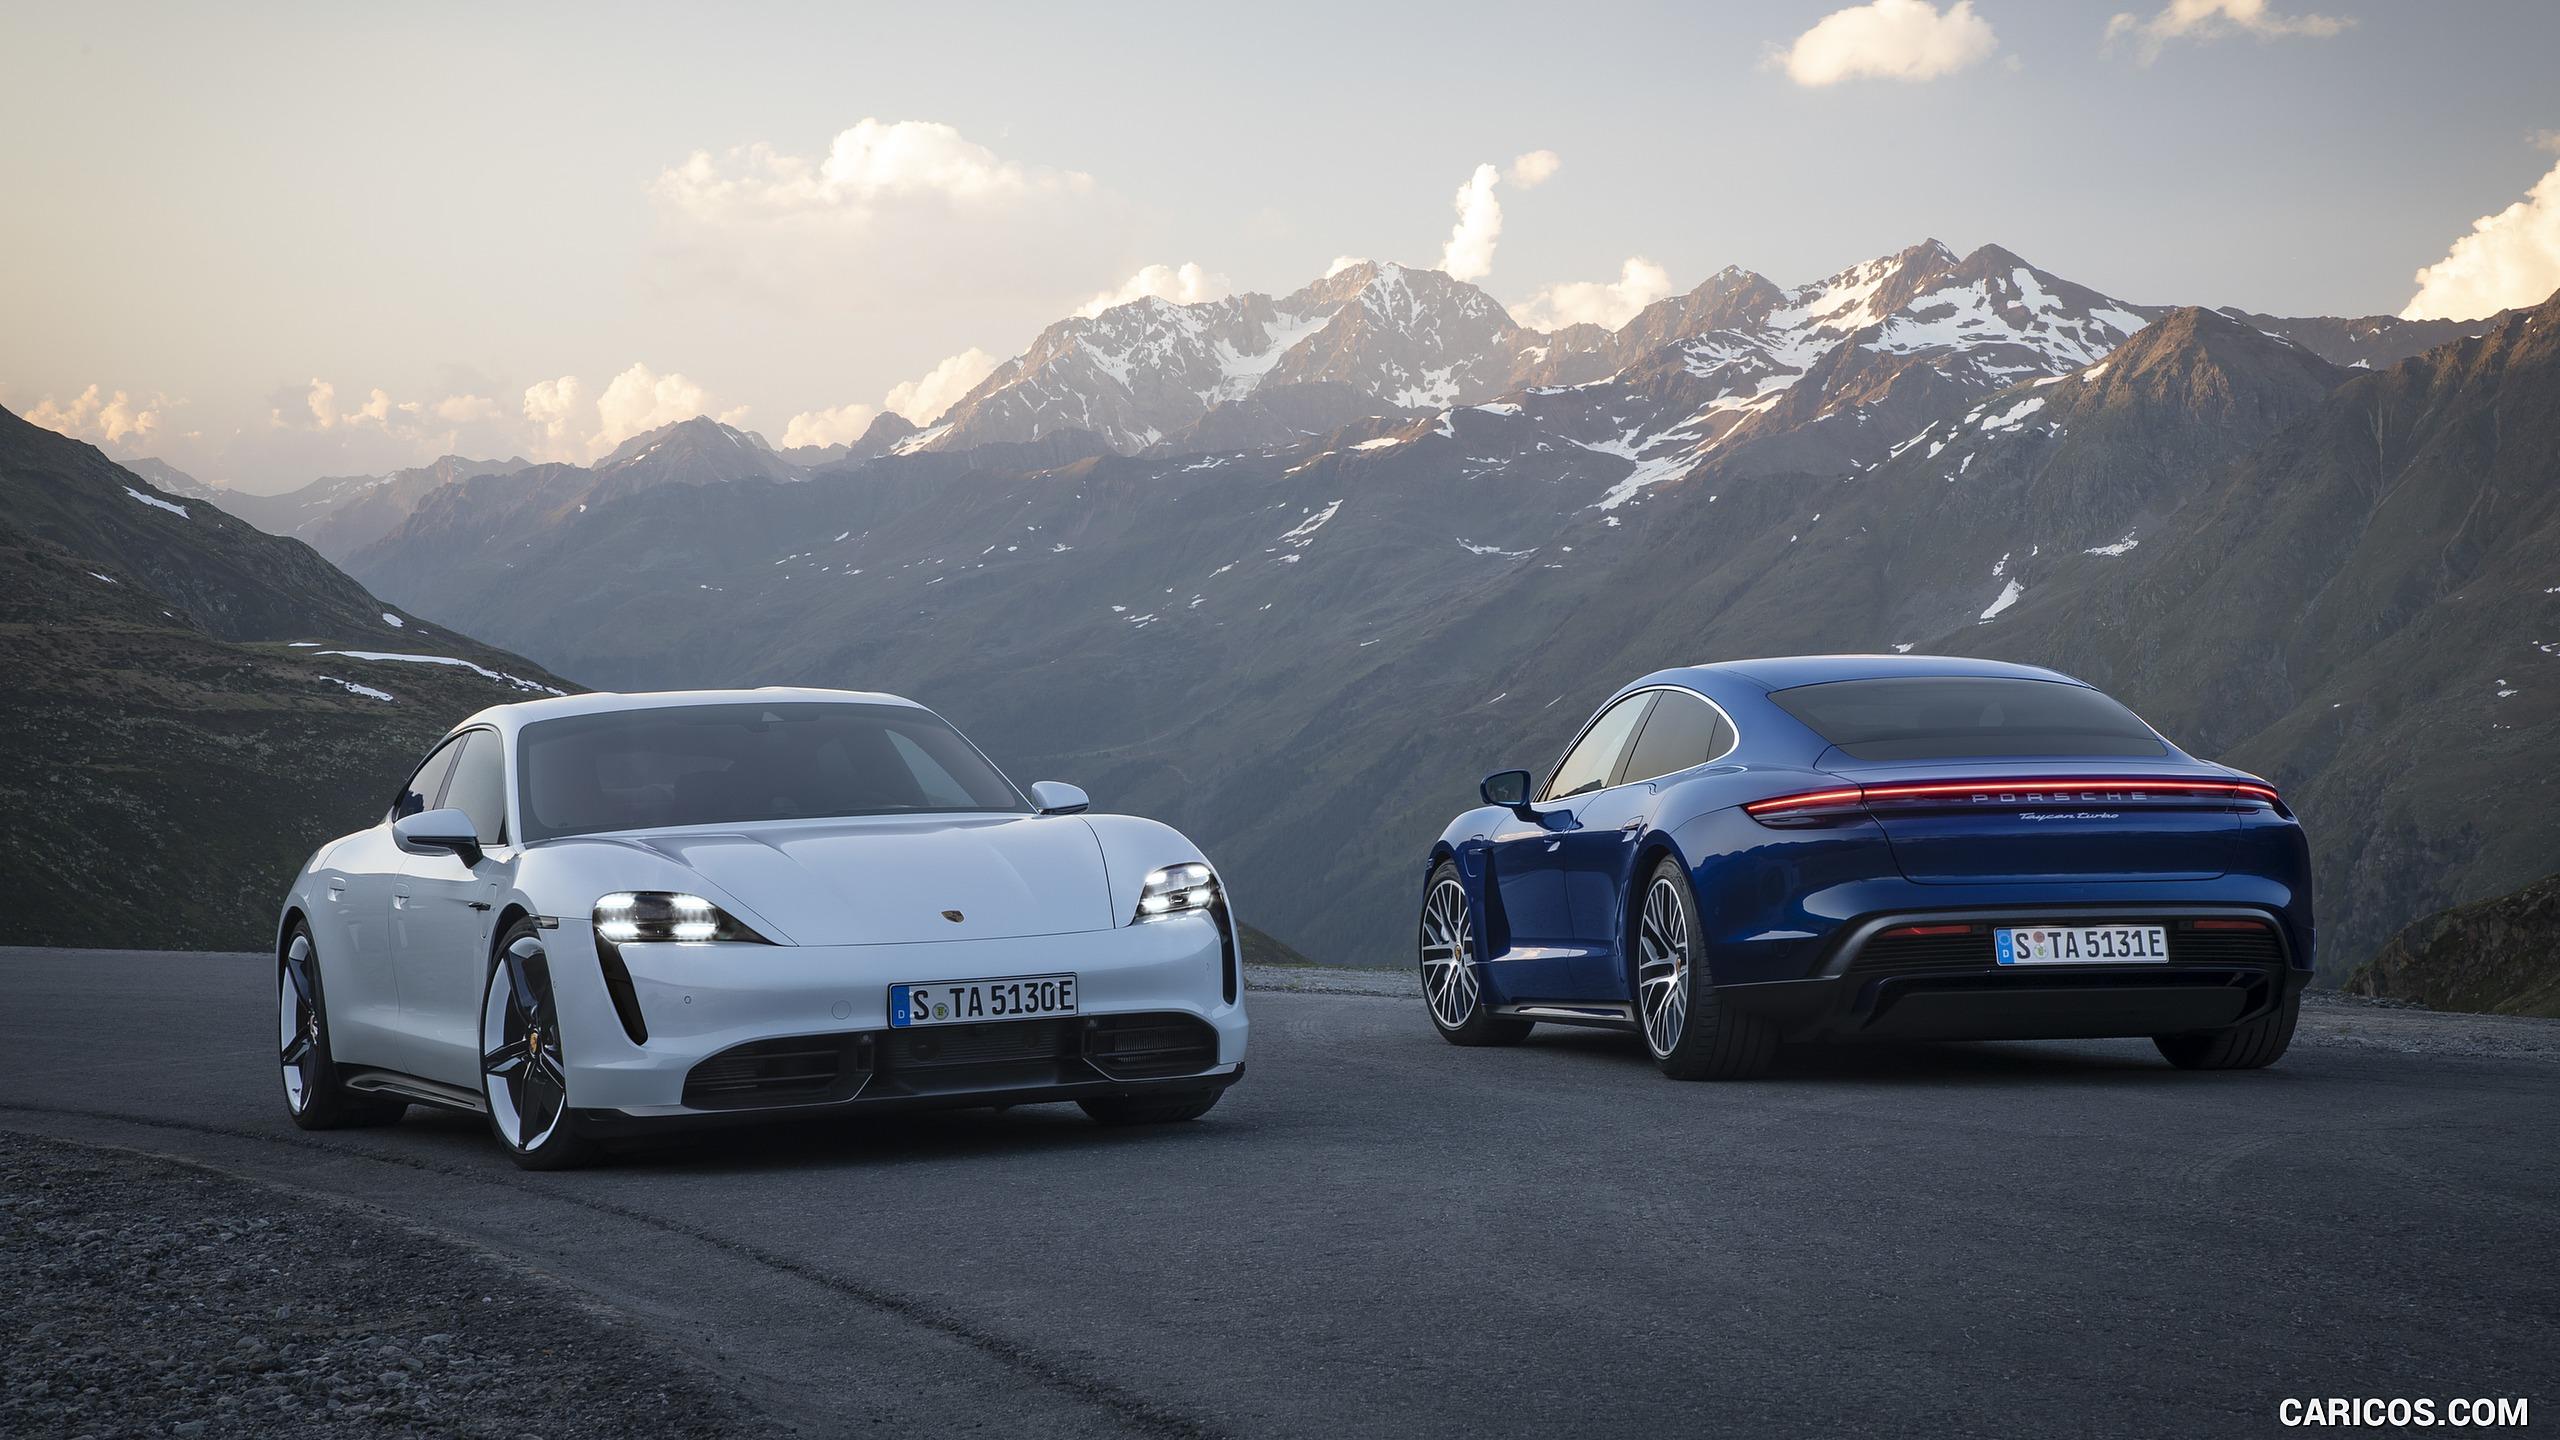 2020 Porsche Taycan Turbo and Taycan Turbo S HD Wallpaper 16 2560x1440